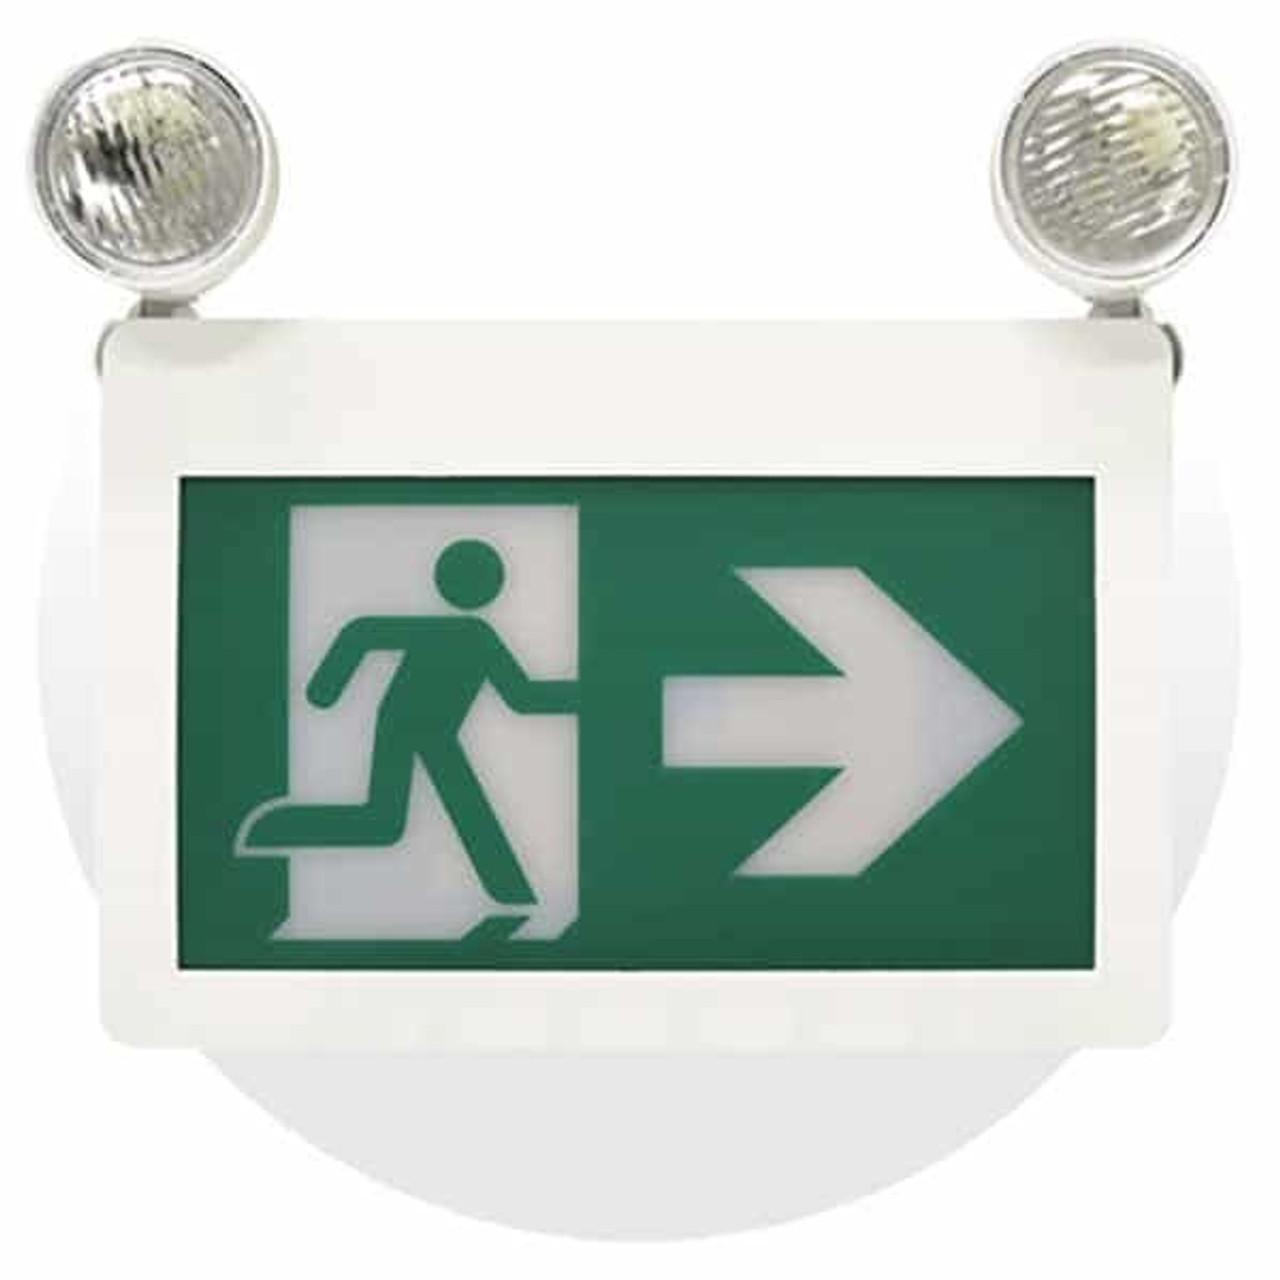 Egress & Evacuation Signs